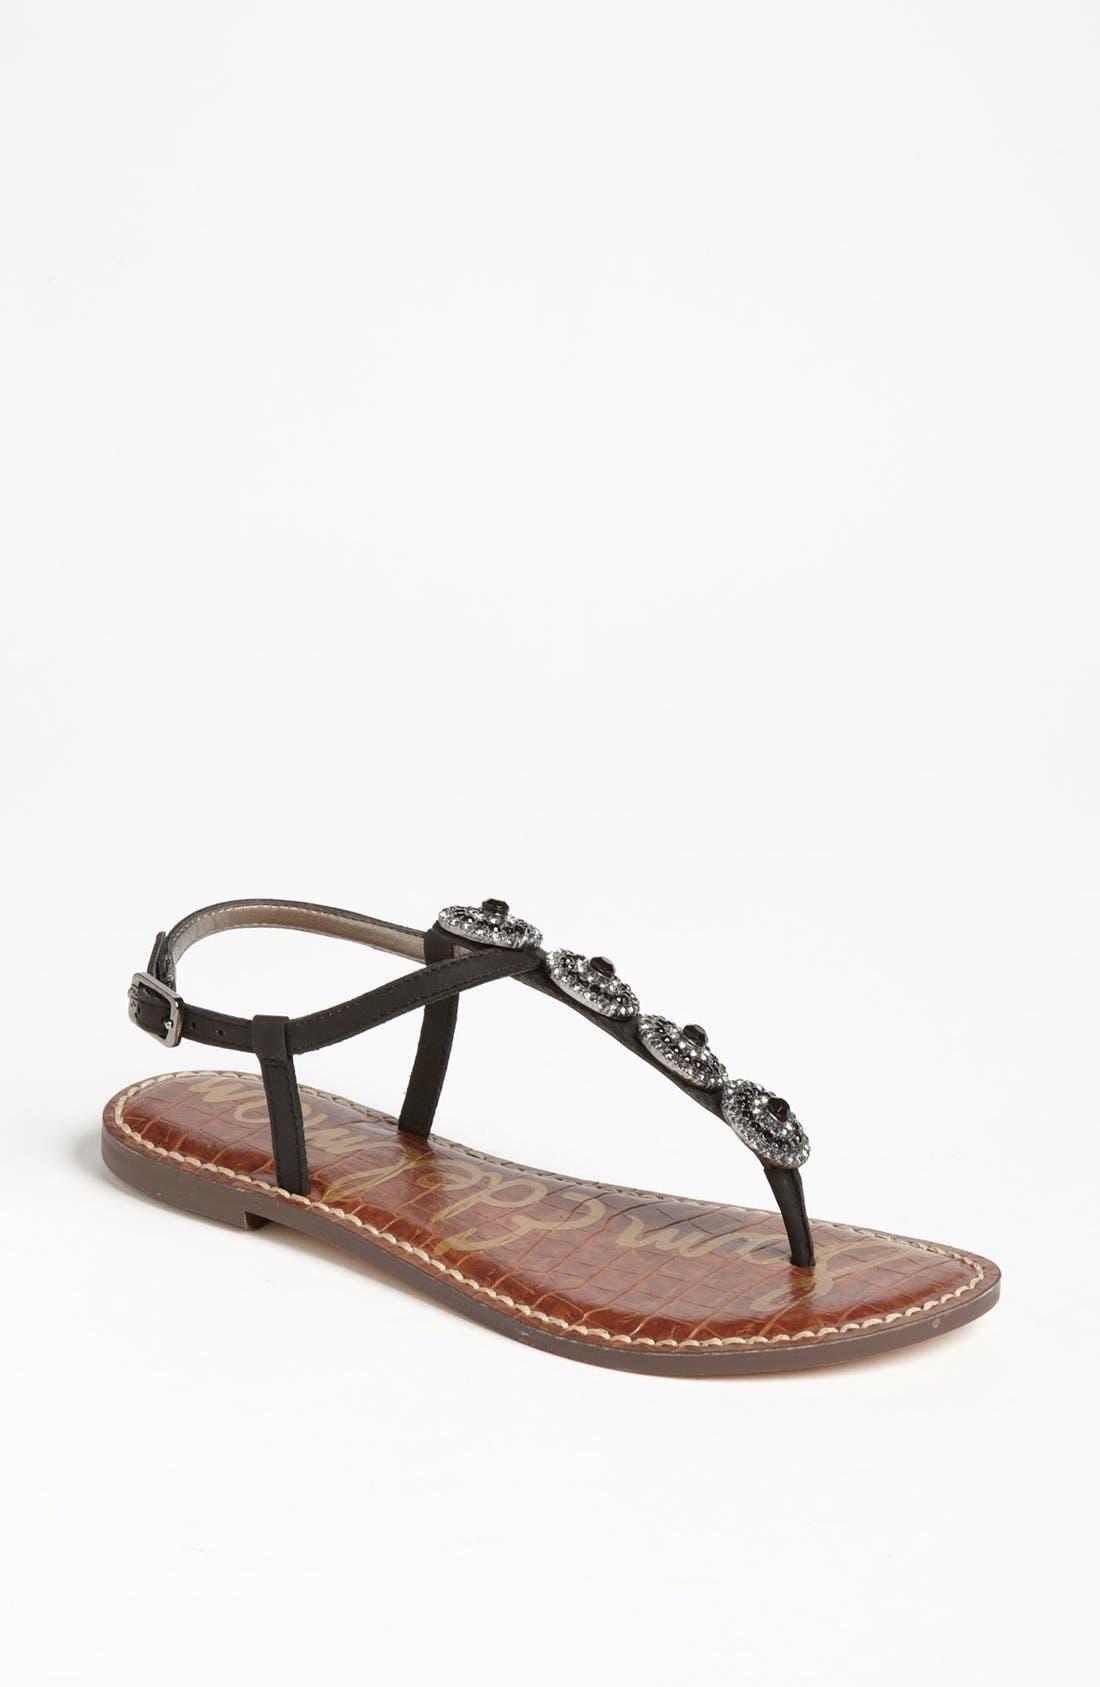 Main Image - Sam Edelman 'Galia' Sandal